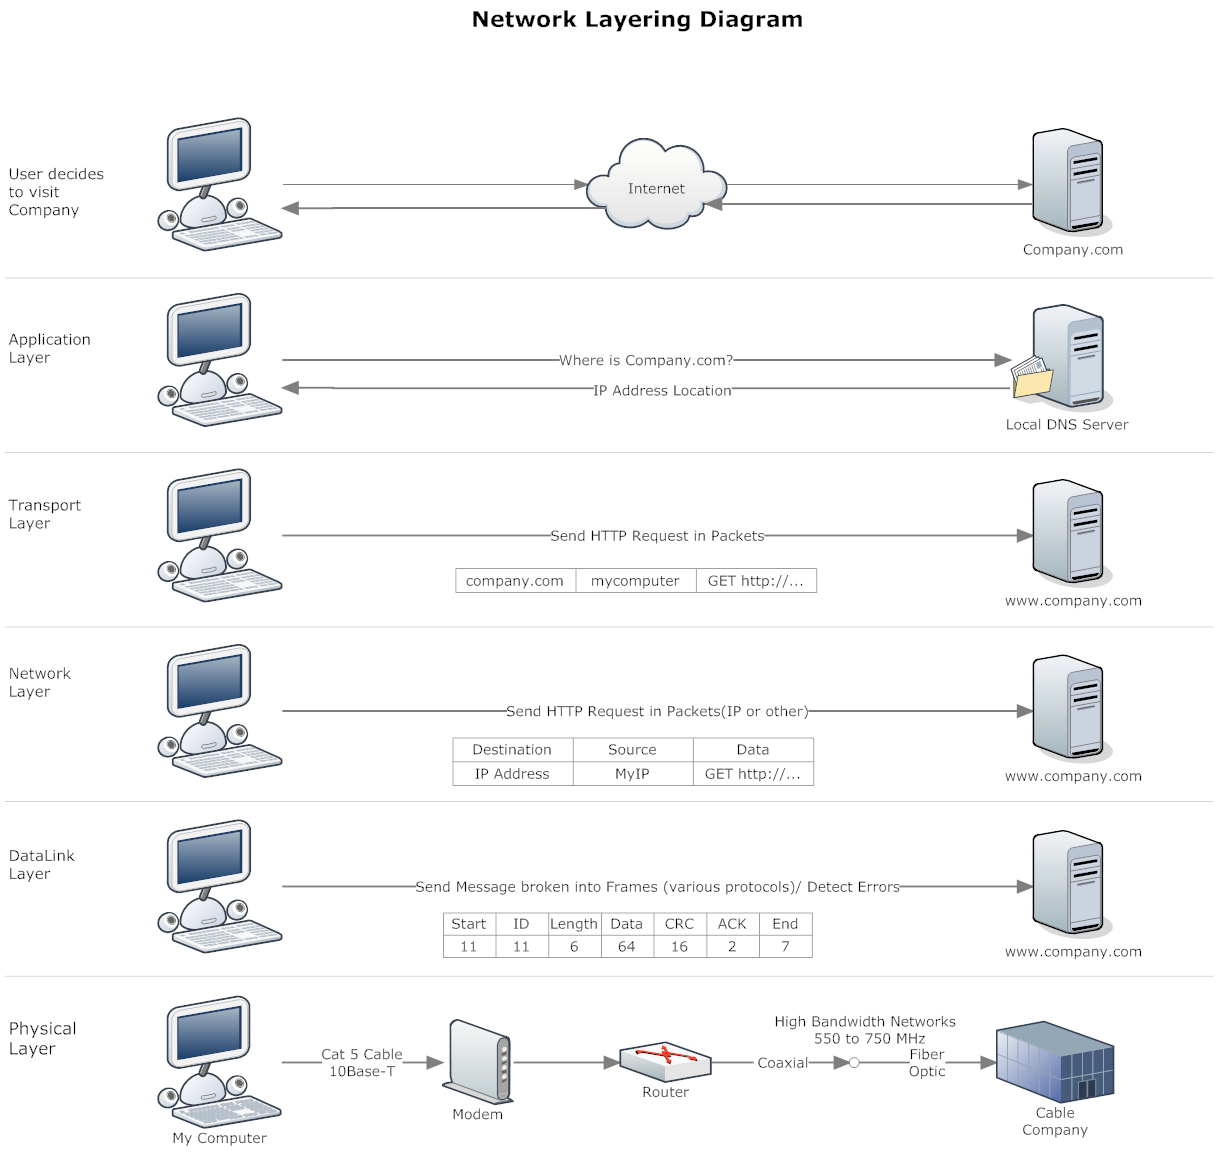 network diagram example network layering diagram computer network software development java layering [ 1218 x 1158 Pixel ]